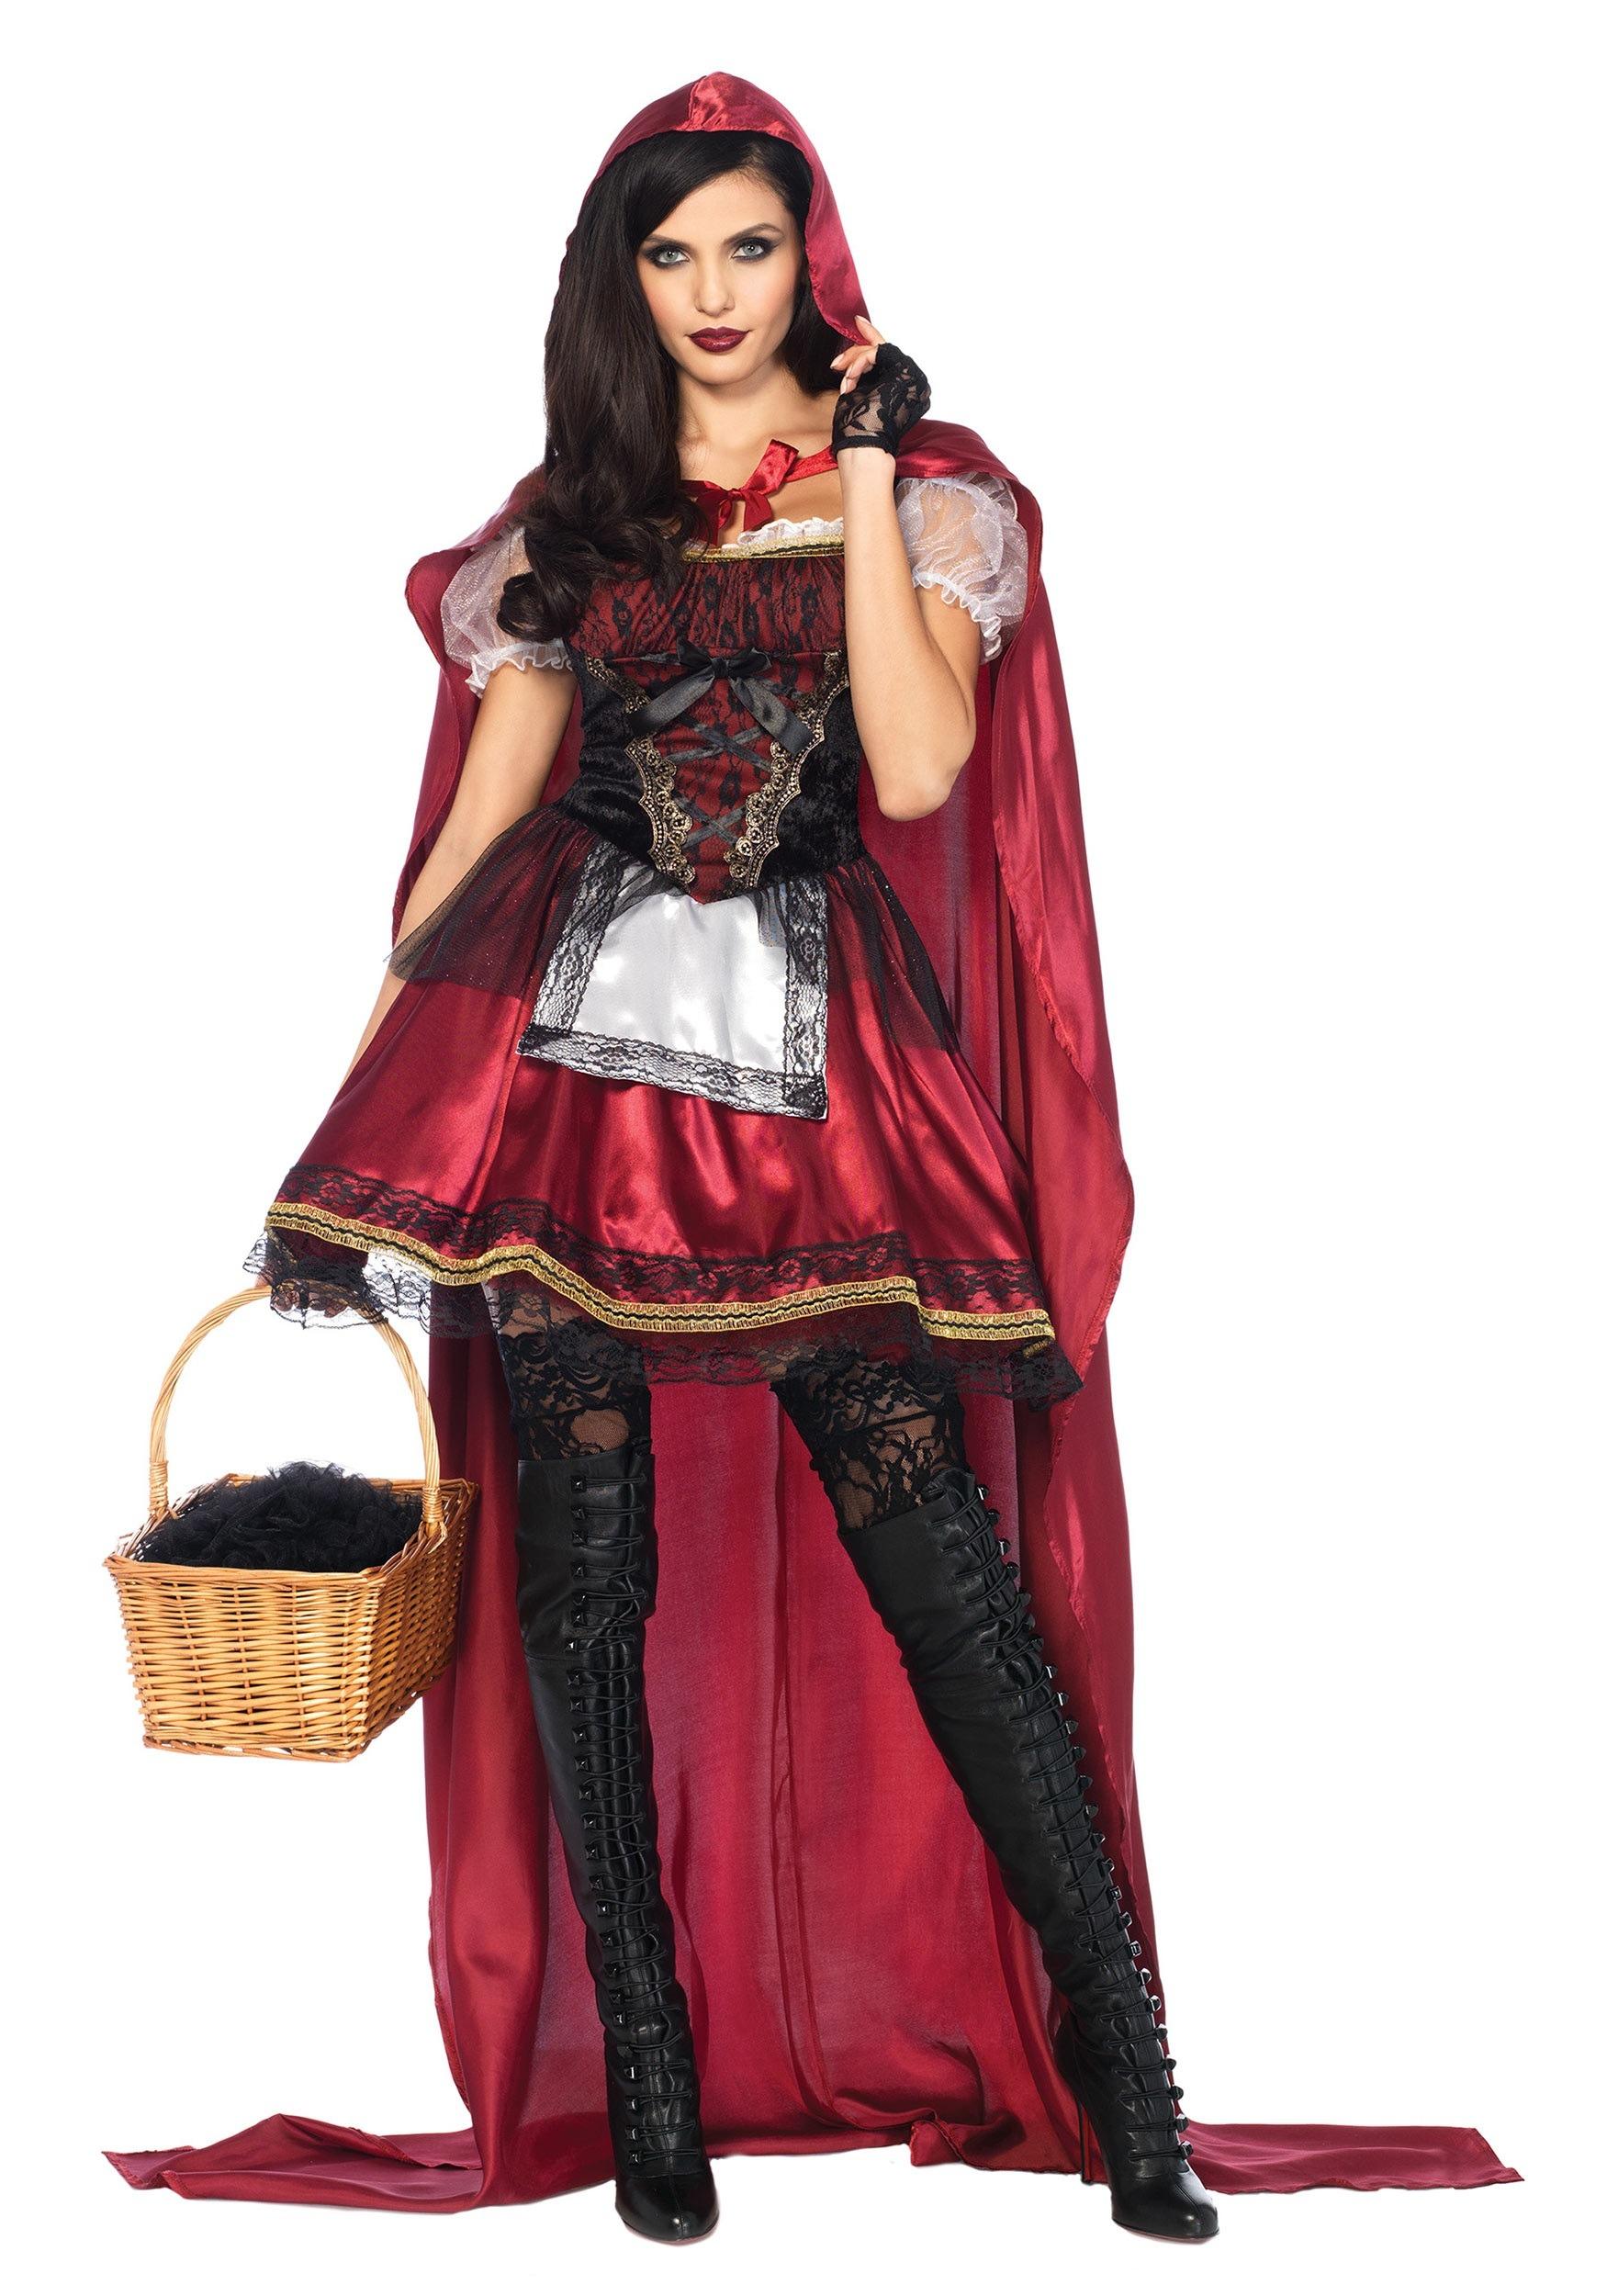 women 39 s captivating miss red costume. Black Bedroom Furniture Sets. Home Design Ideas